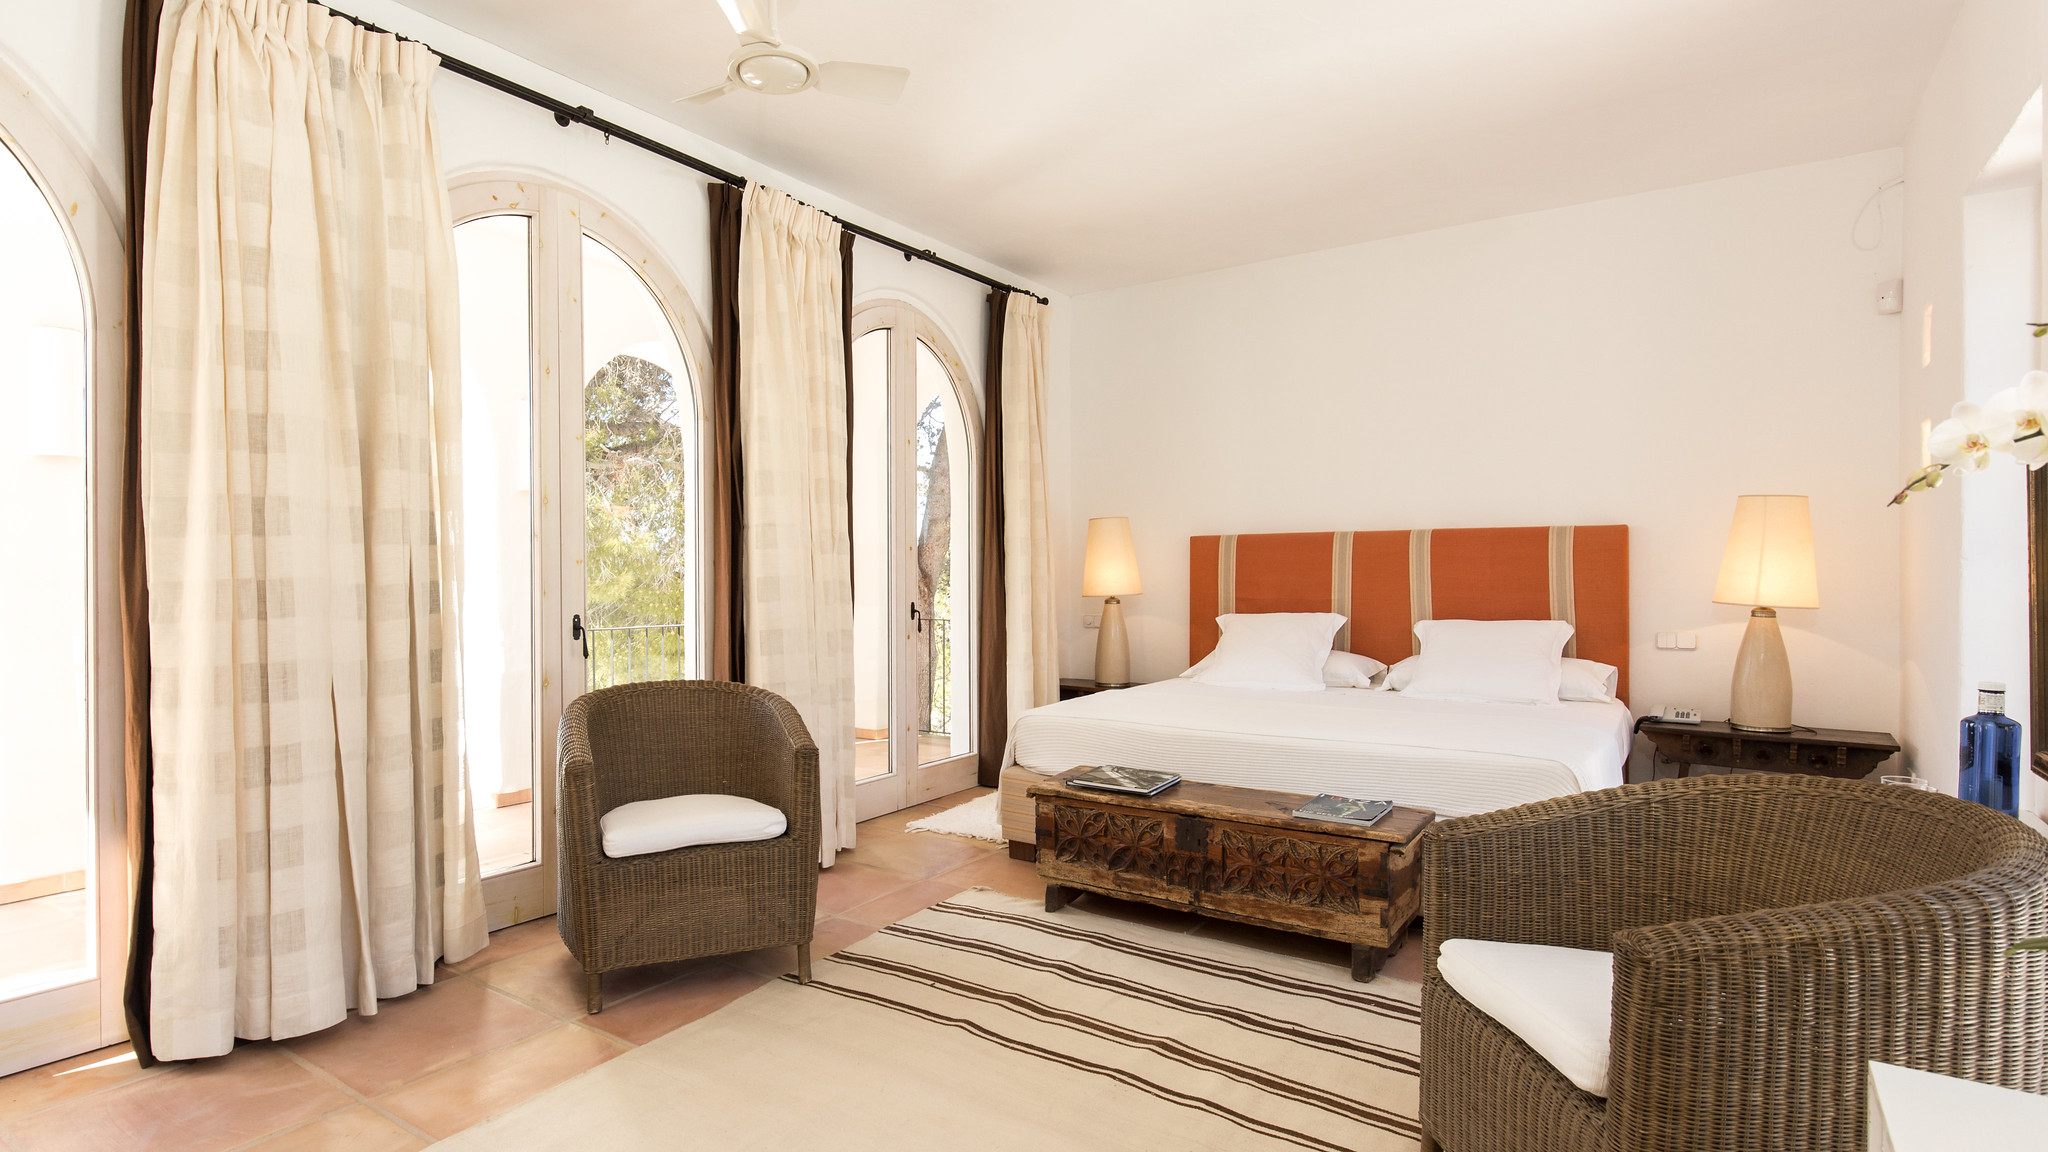 https://www.white-ibiza.com/wp-content/uploads/2020/05/white-ibiza-villas-can-amelida-interior-bedroom.jpg